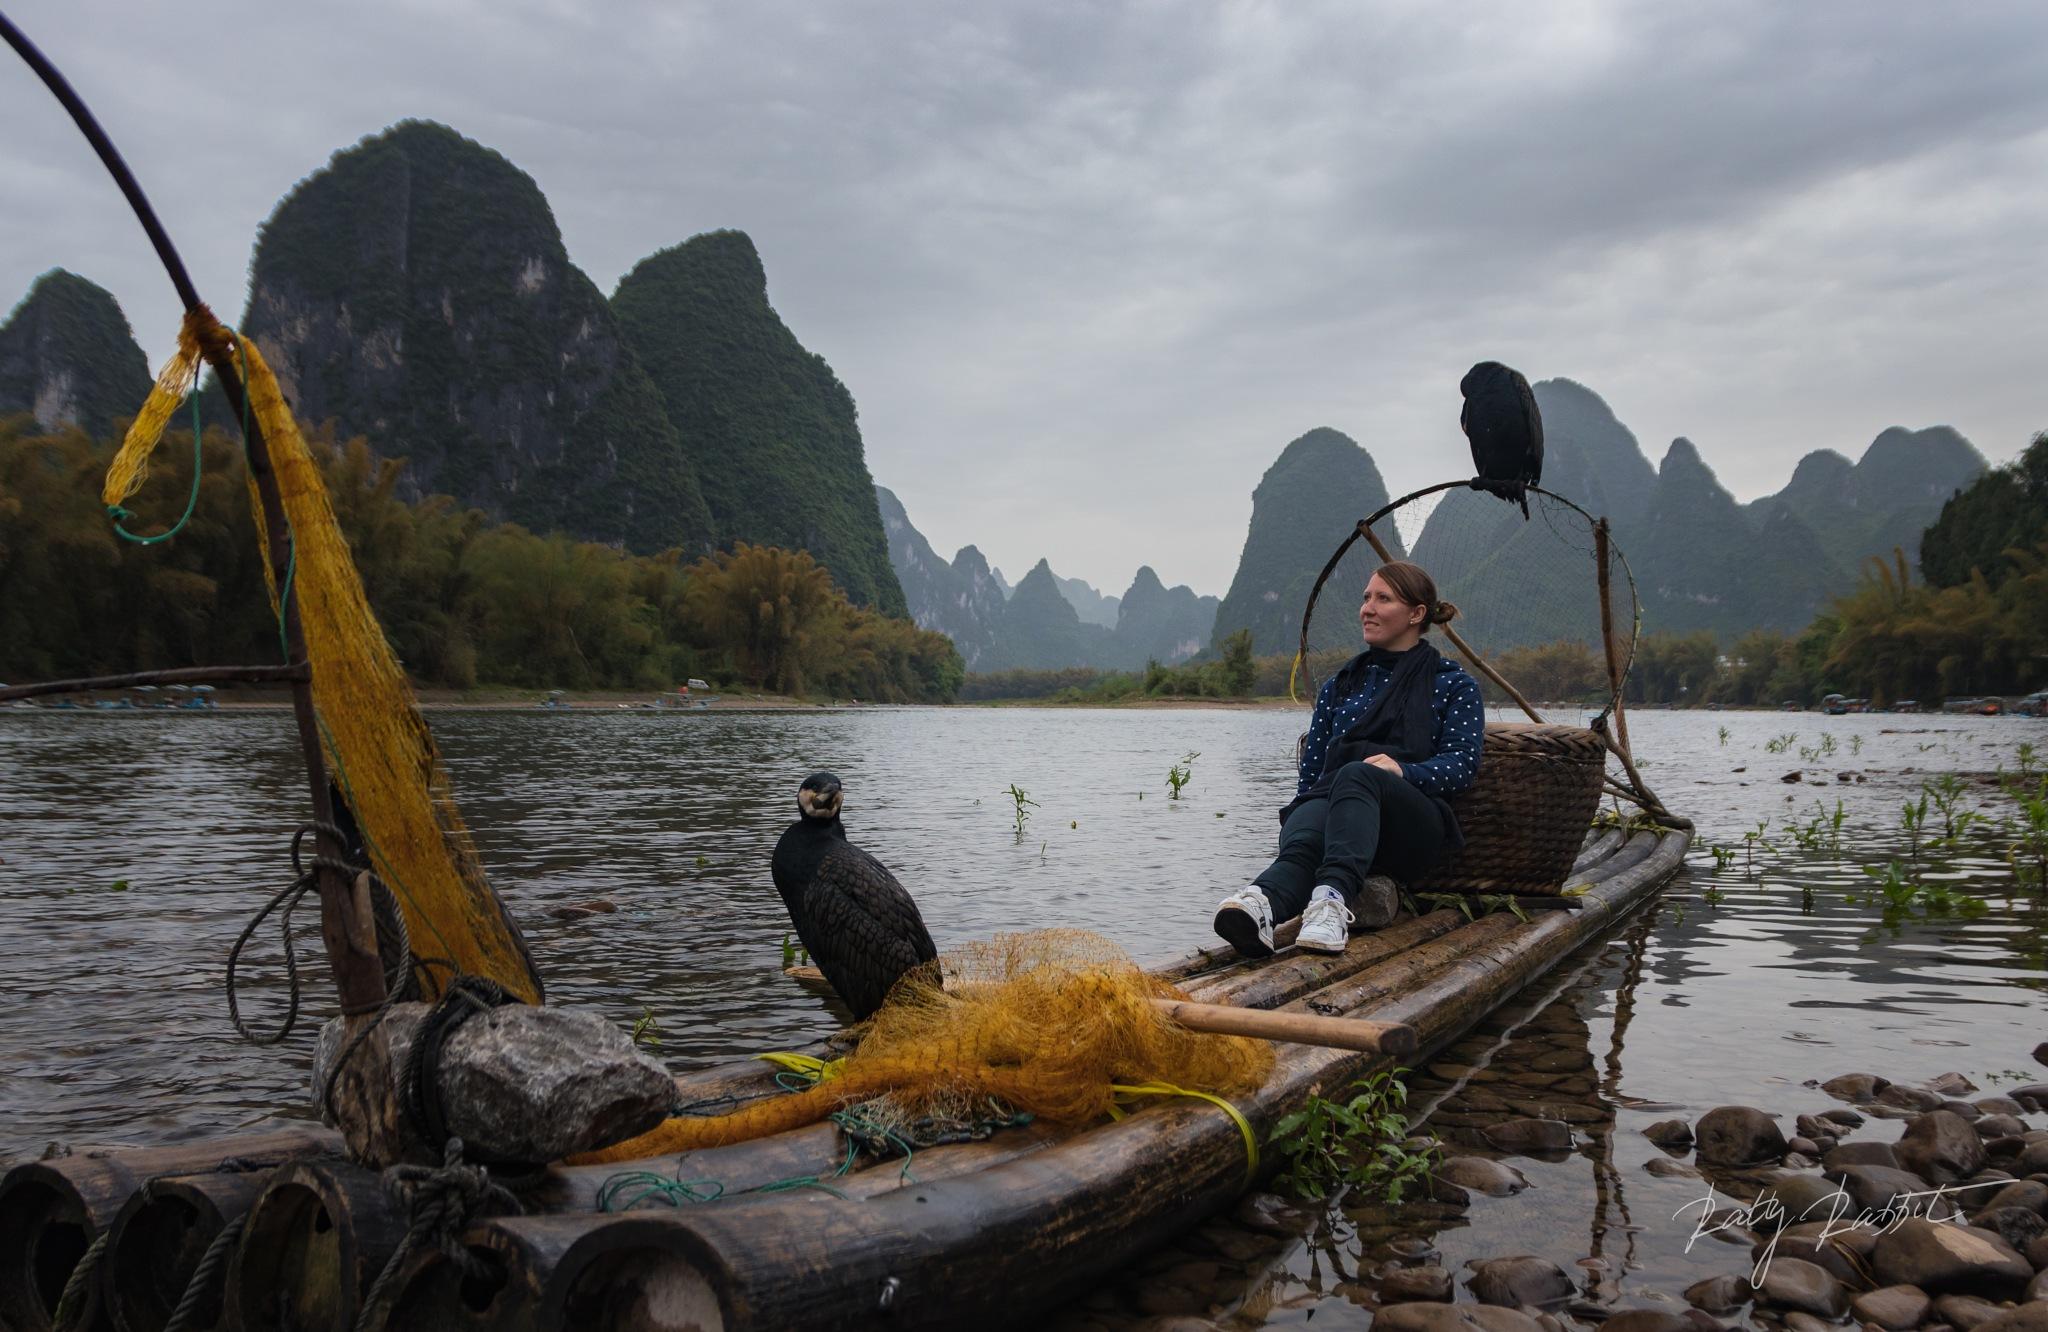 Memories of Yangshuo by Lenka Znamenackova